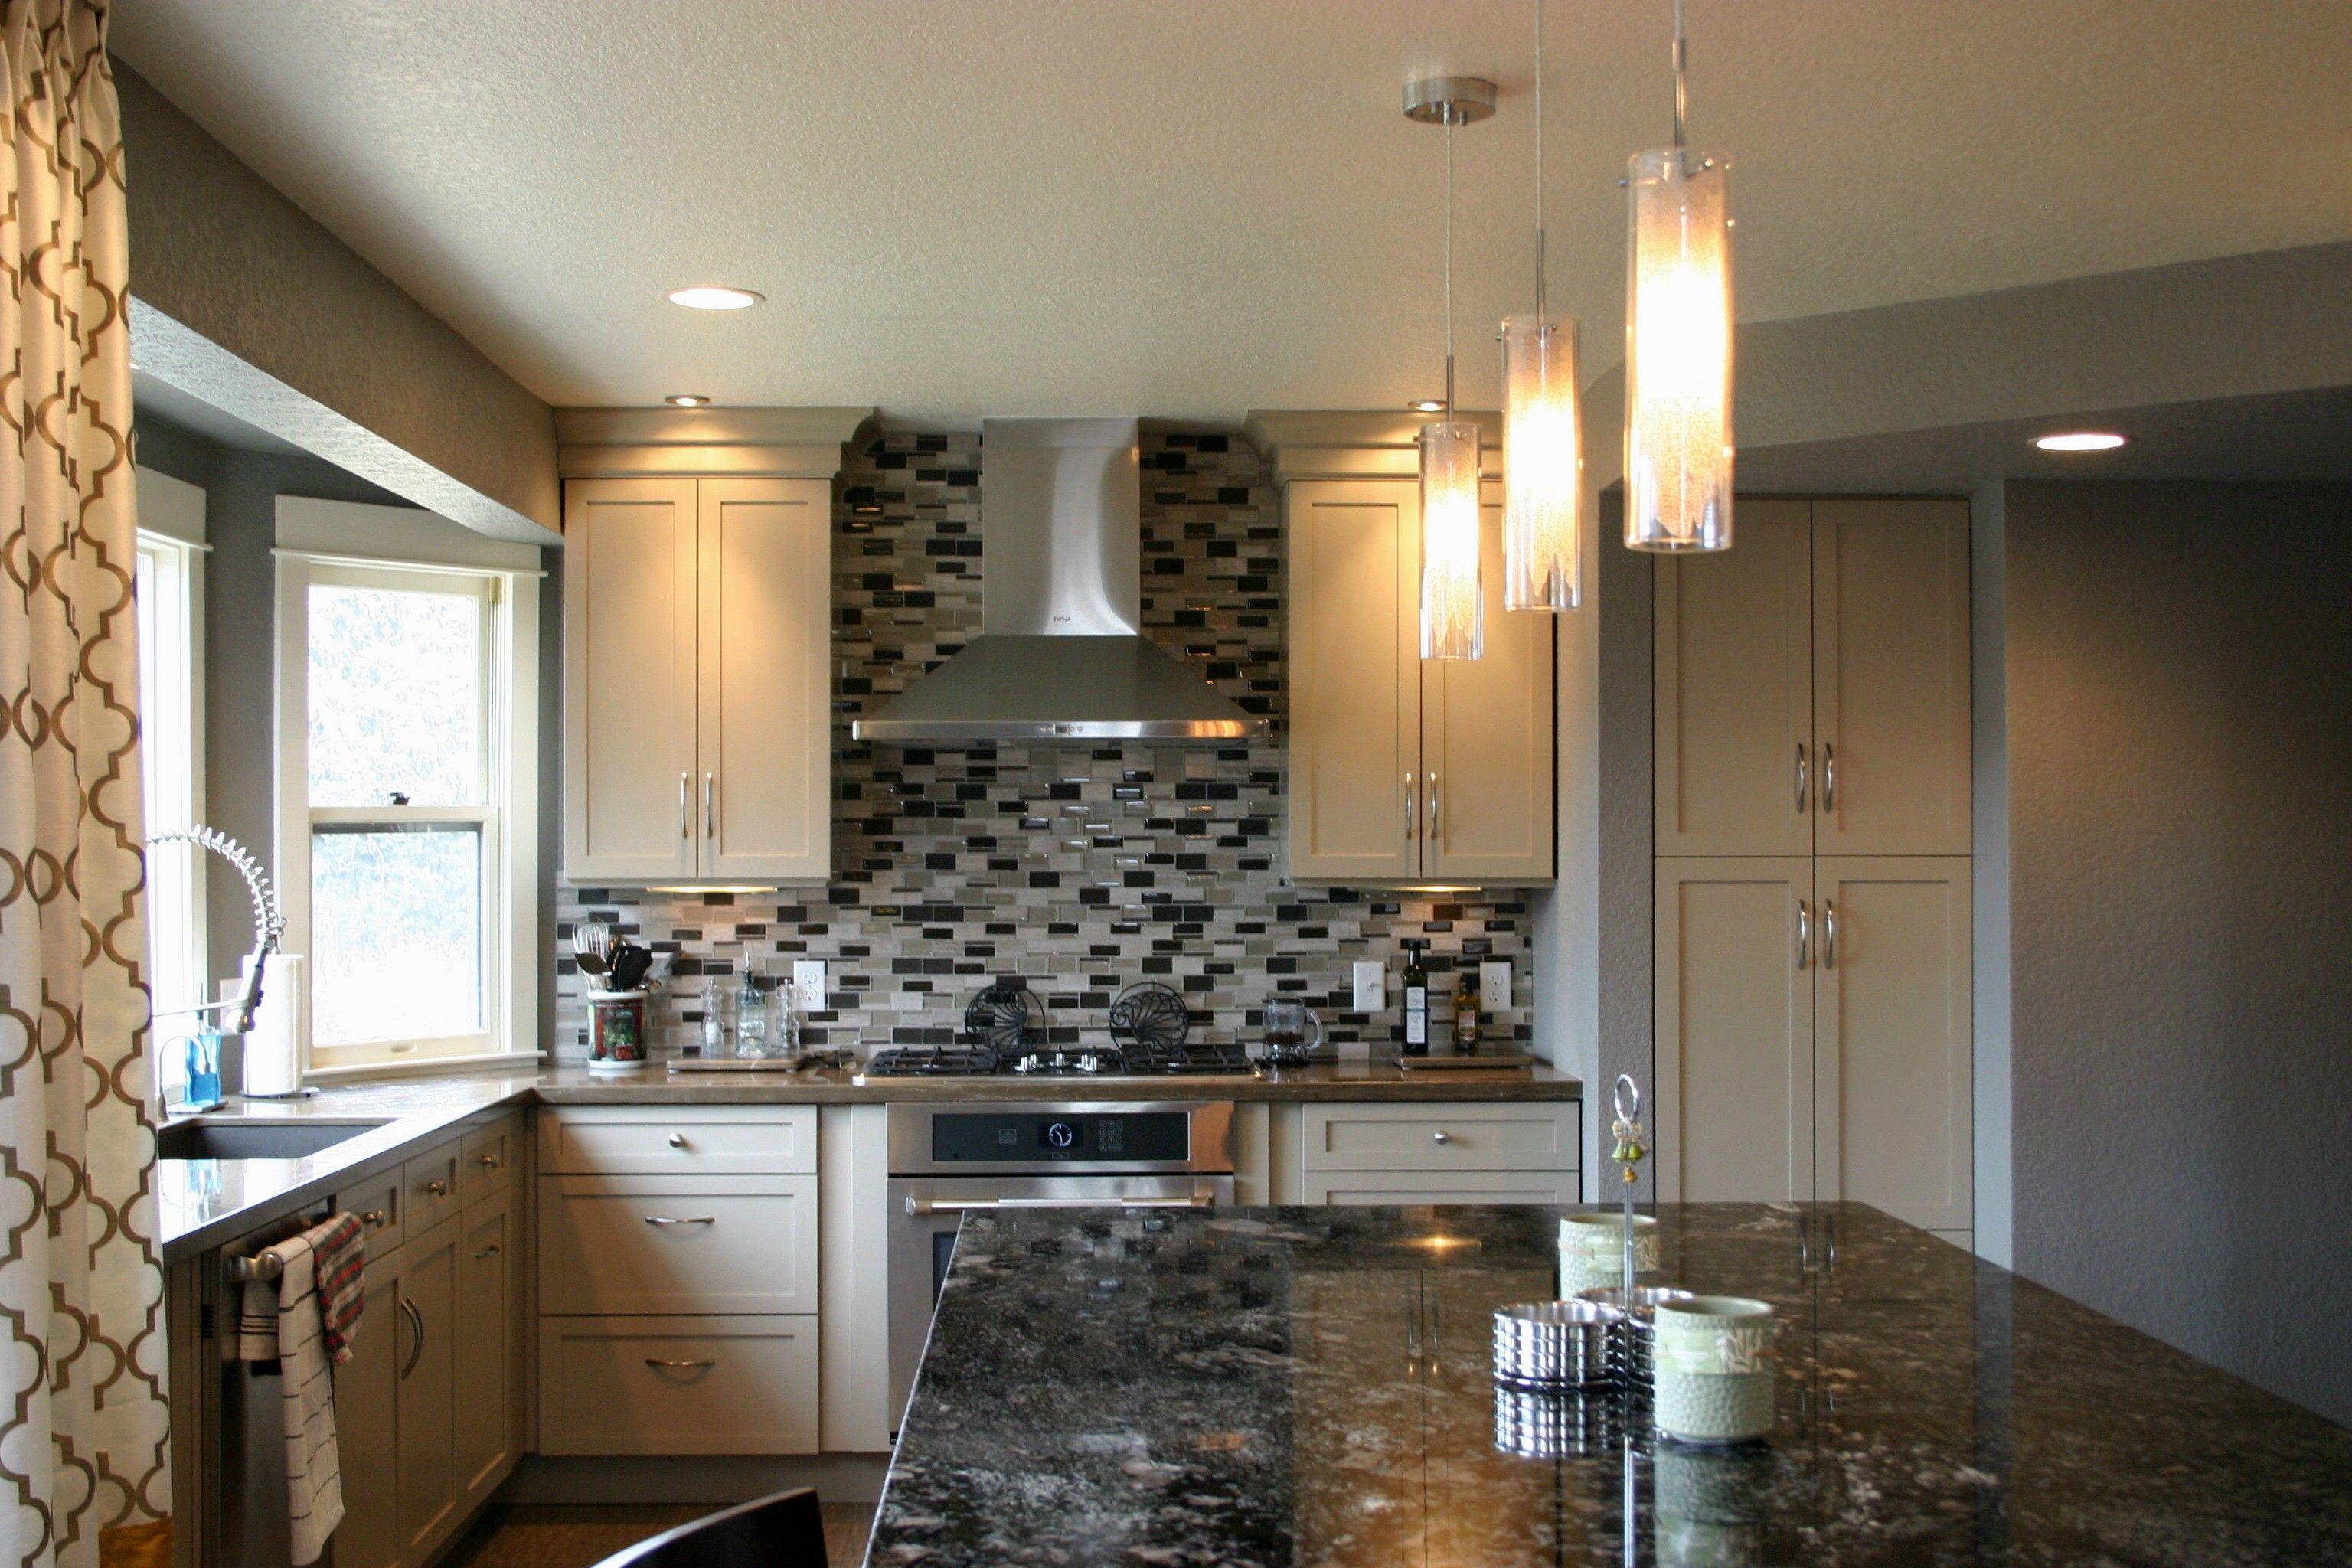 BKC Kitchen and Bath Denver kitchen remodel - Perimeter cabinetry ...